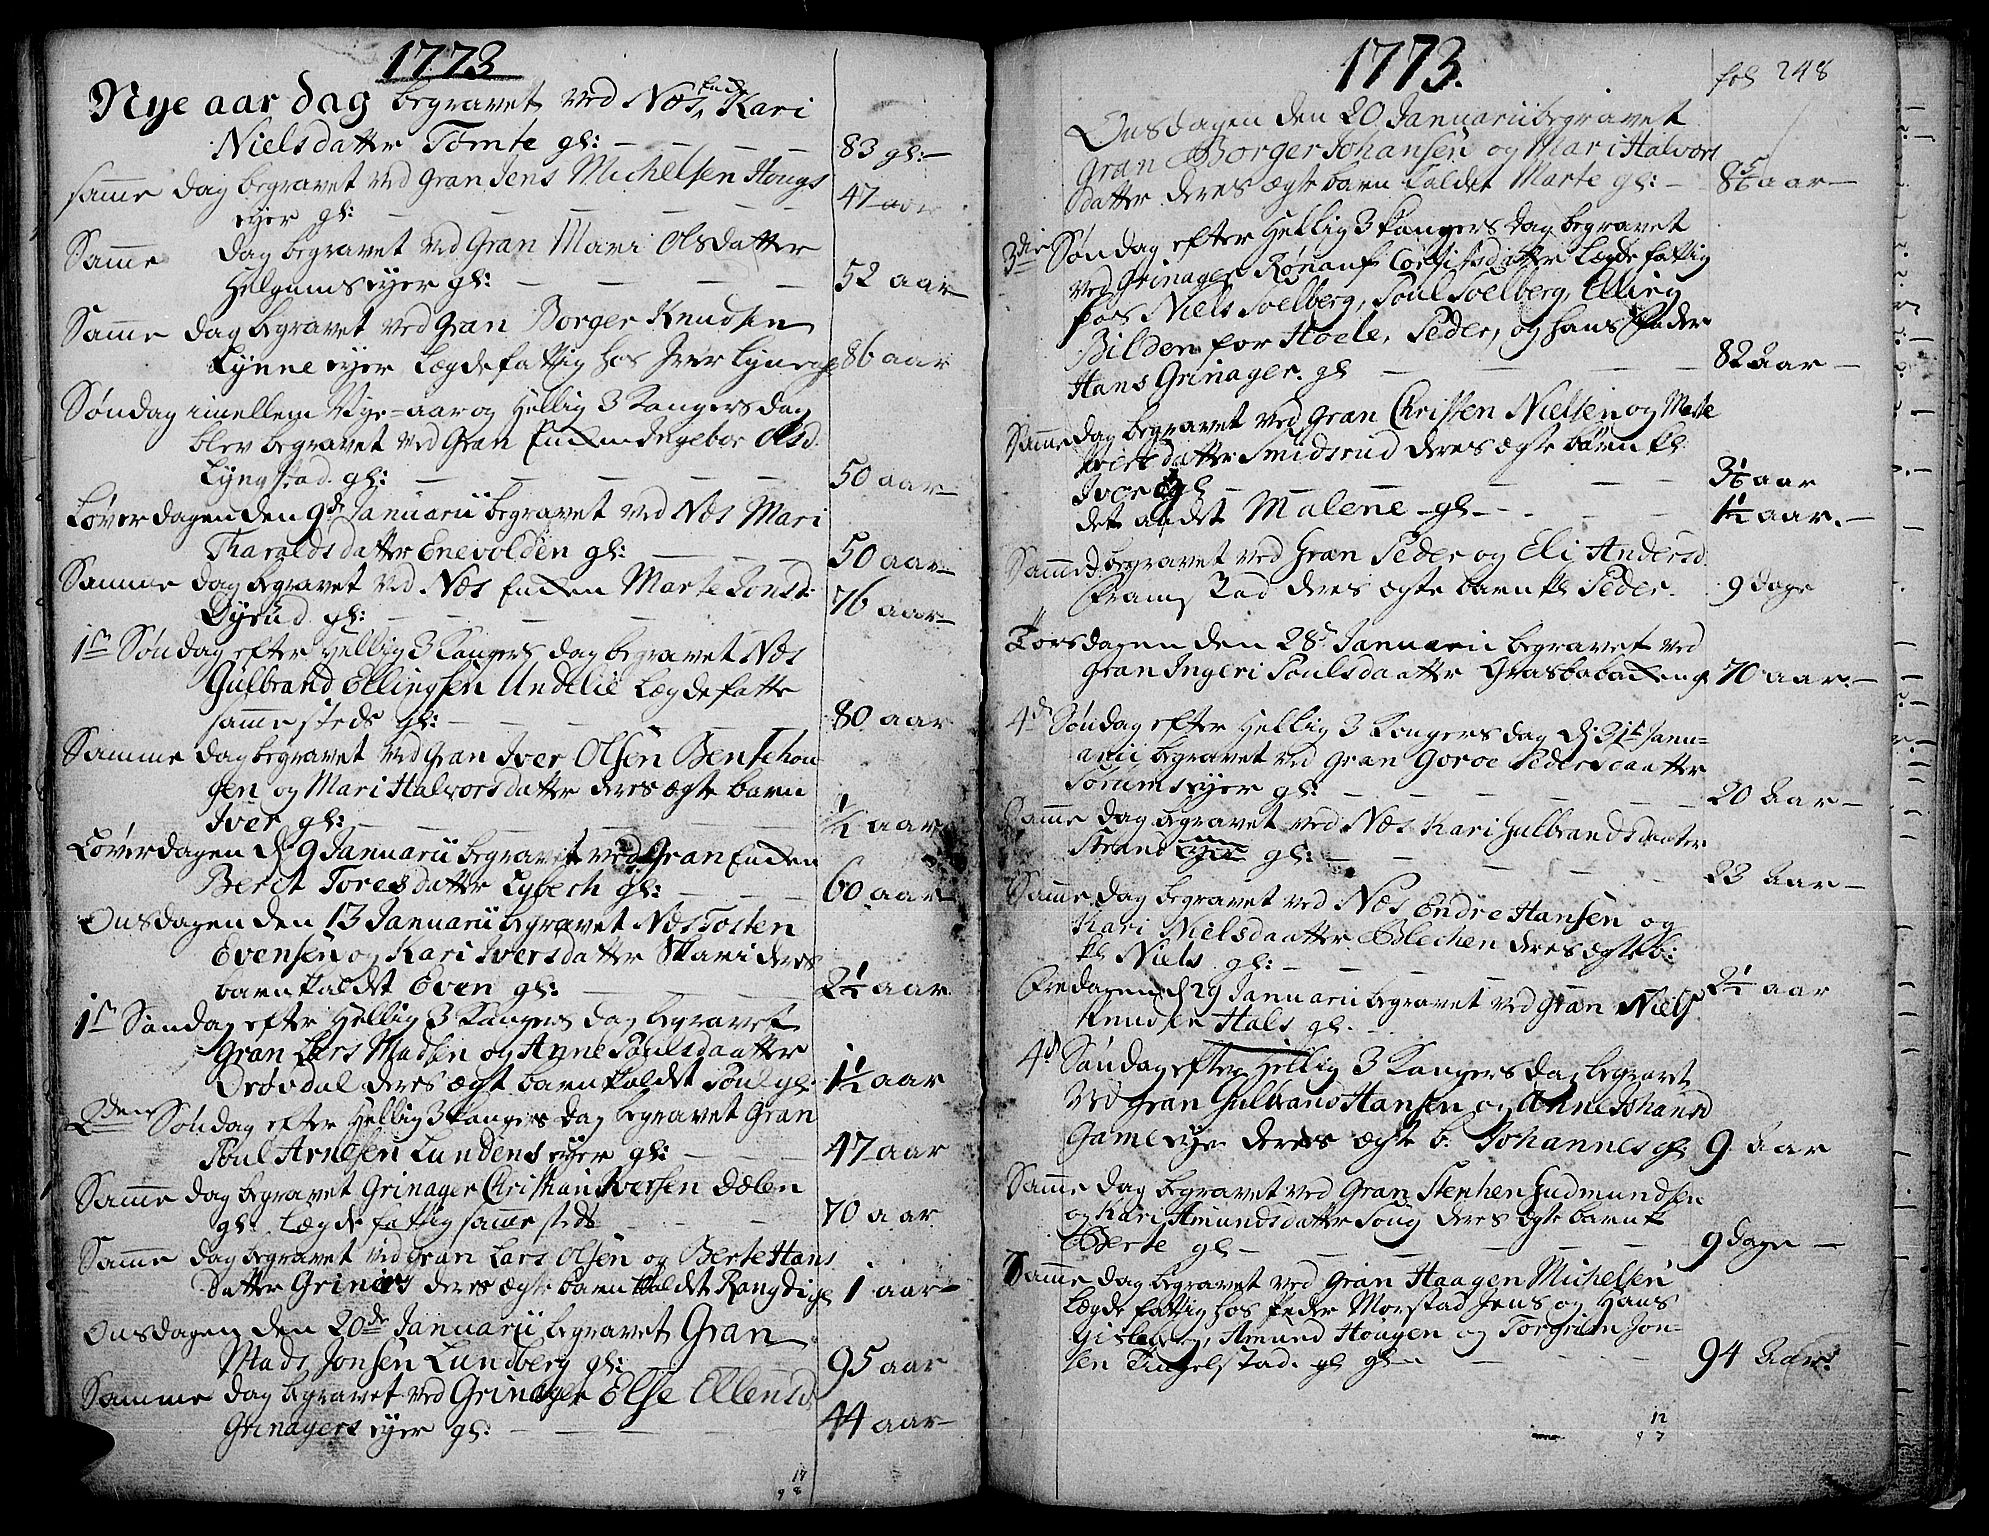 SAH, Gran prestekontor, Ministerialbok nr. 4, 1759-1775, s. 248